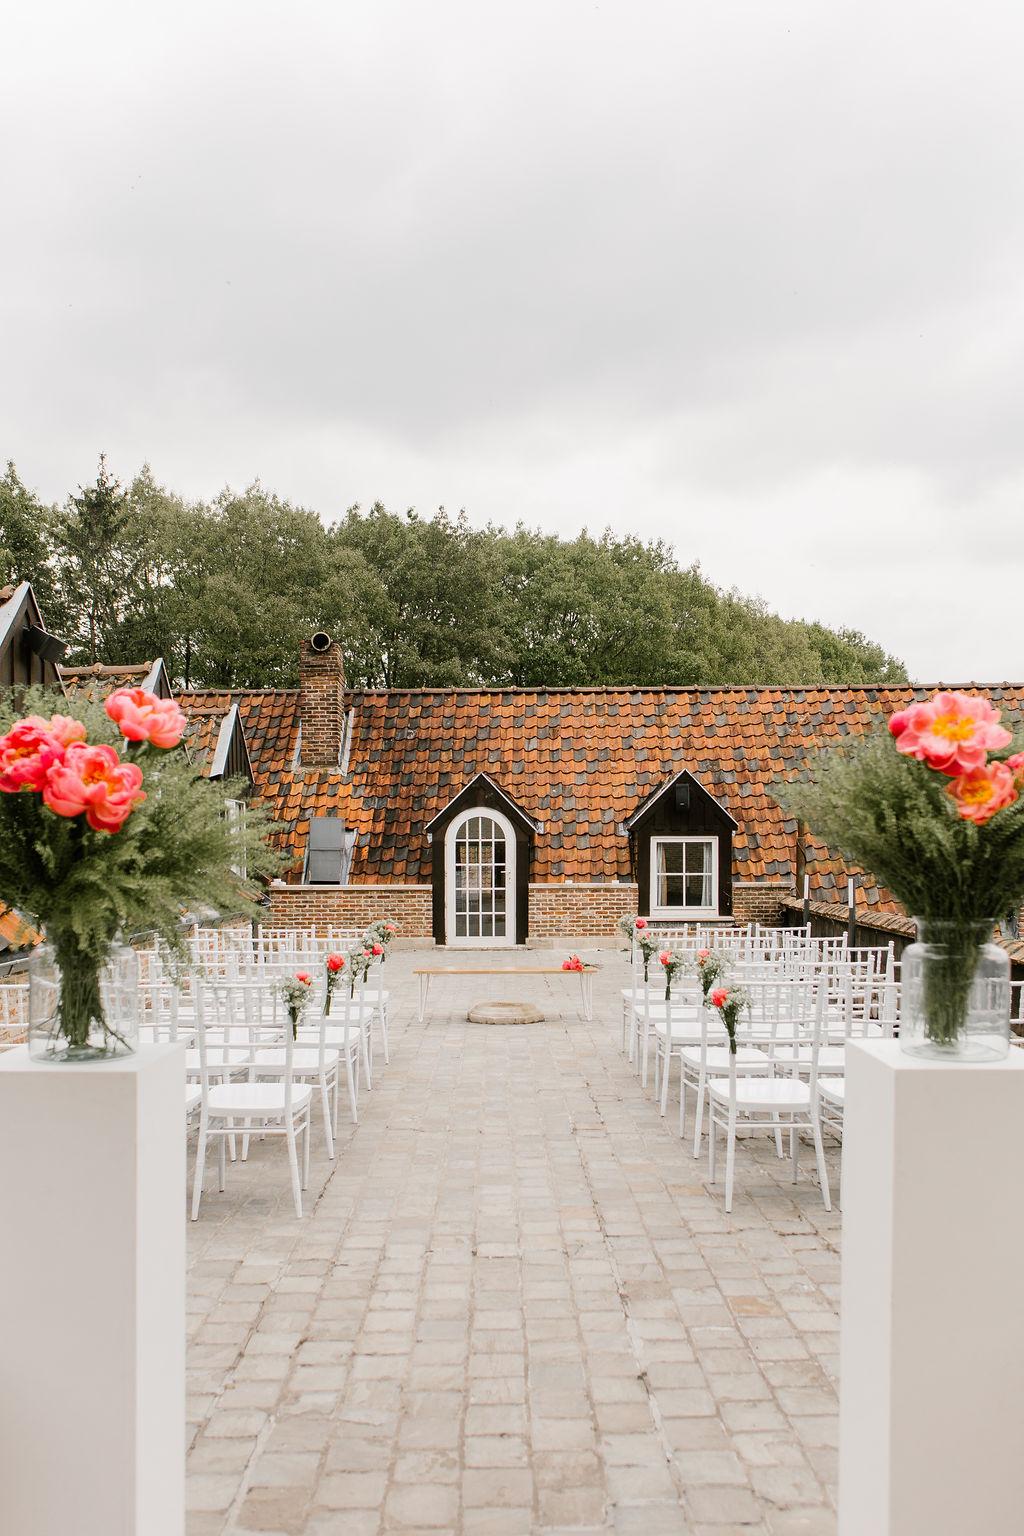 Stijlvol trouwfeest